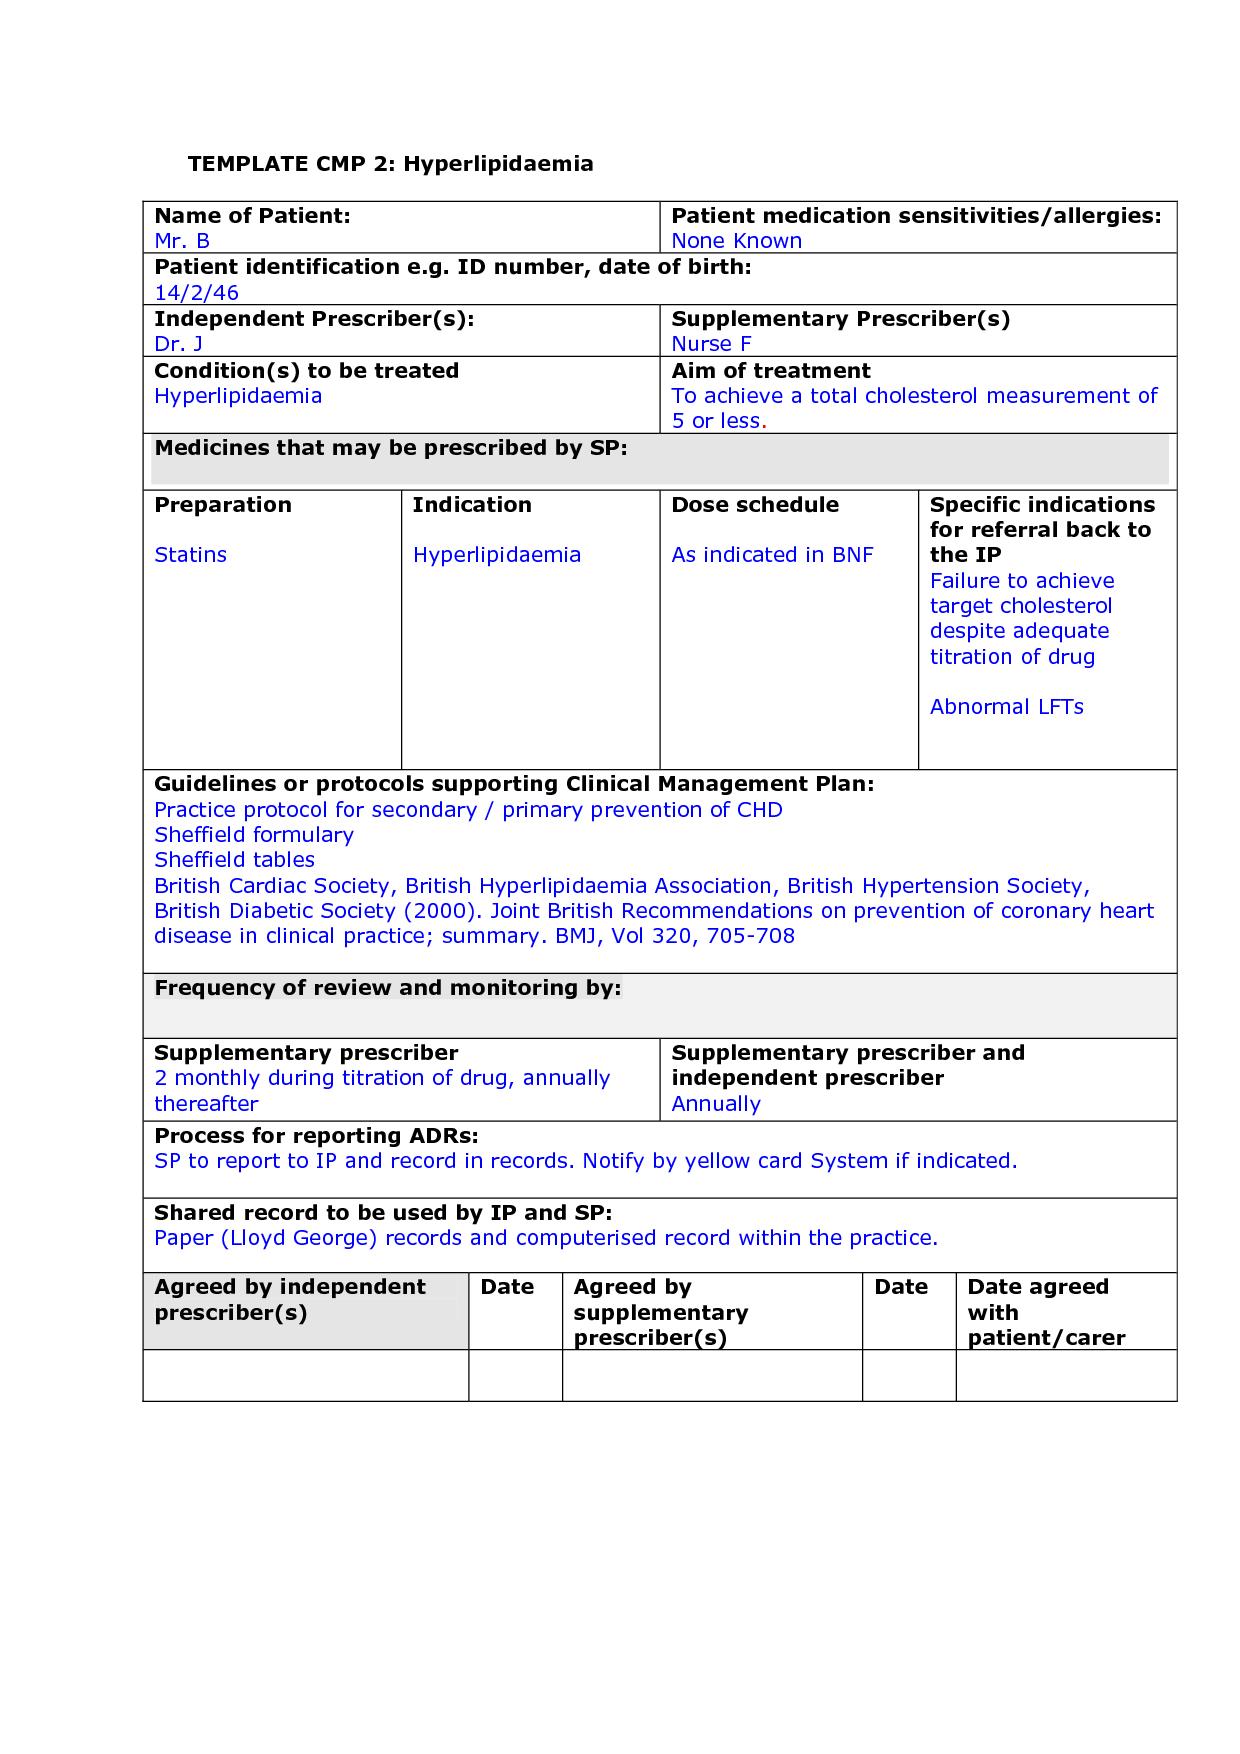 Nursing Student Drug Card Template  Nursing School  Nursing School With Medication Card Template